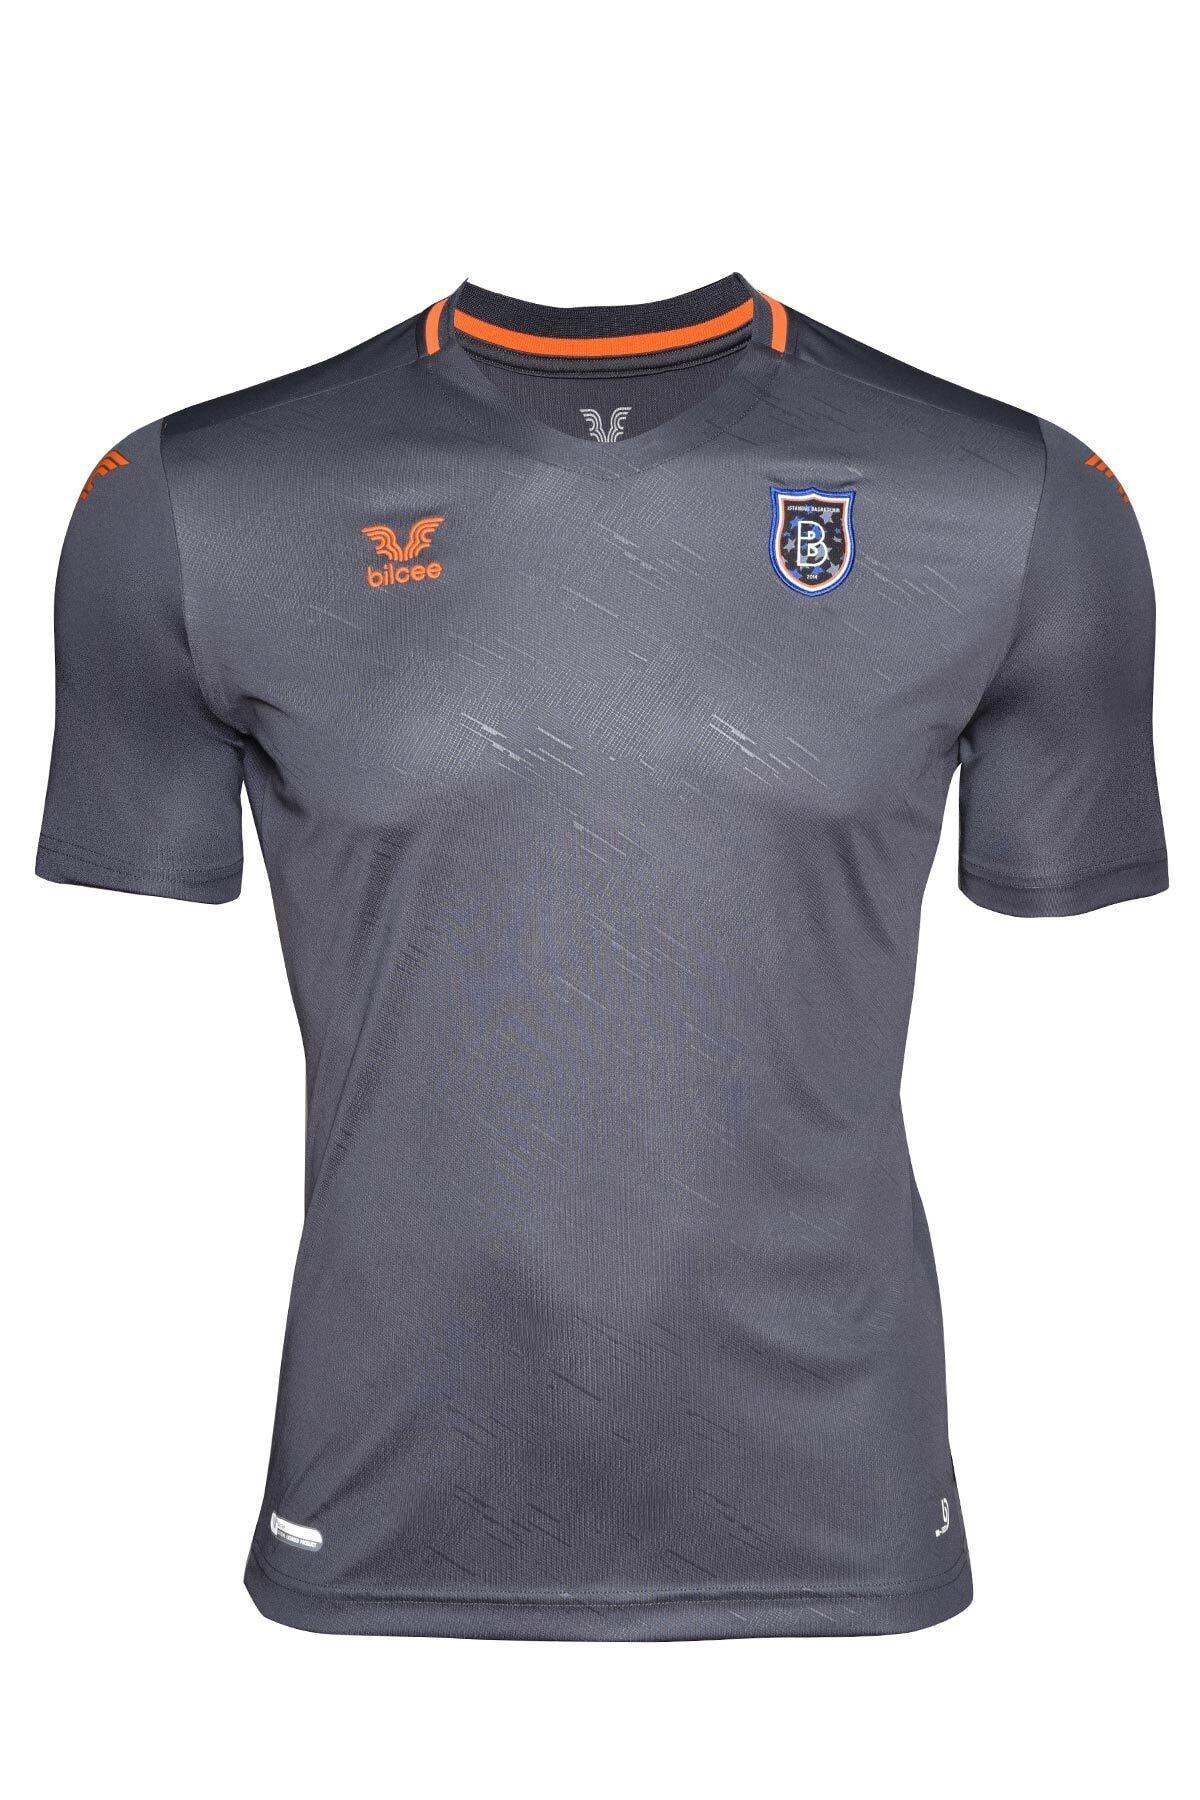 bilcee Başakşehir Antrasit Antrenman T-Shirt BS-3476 1